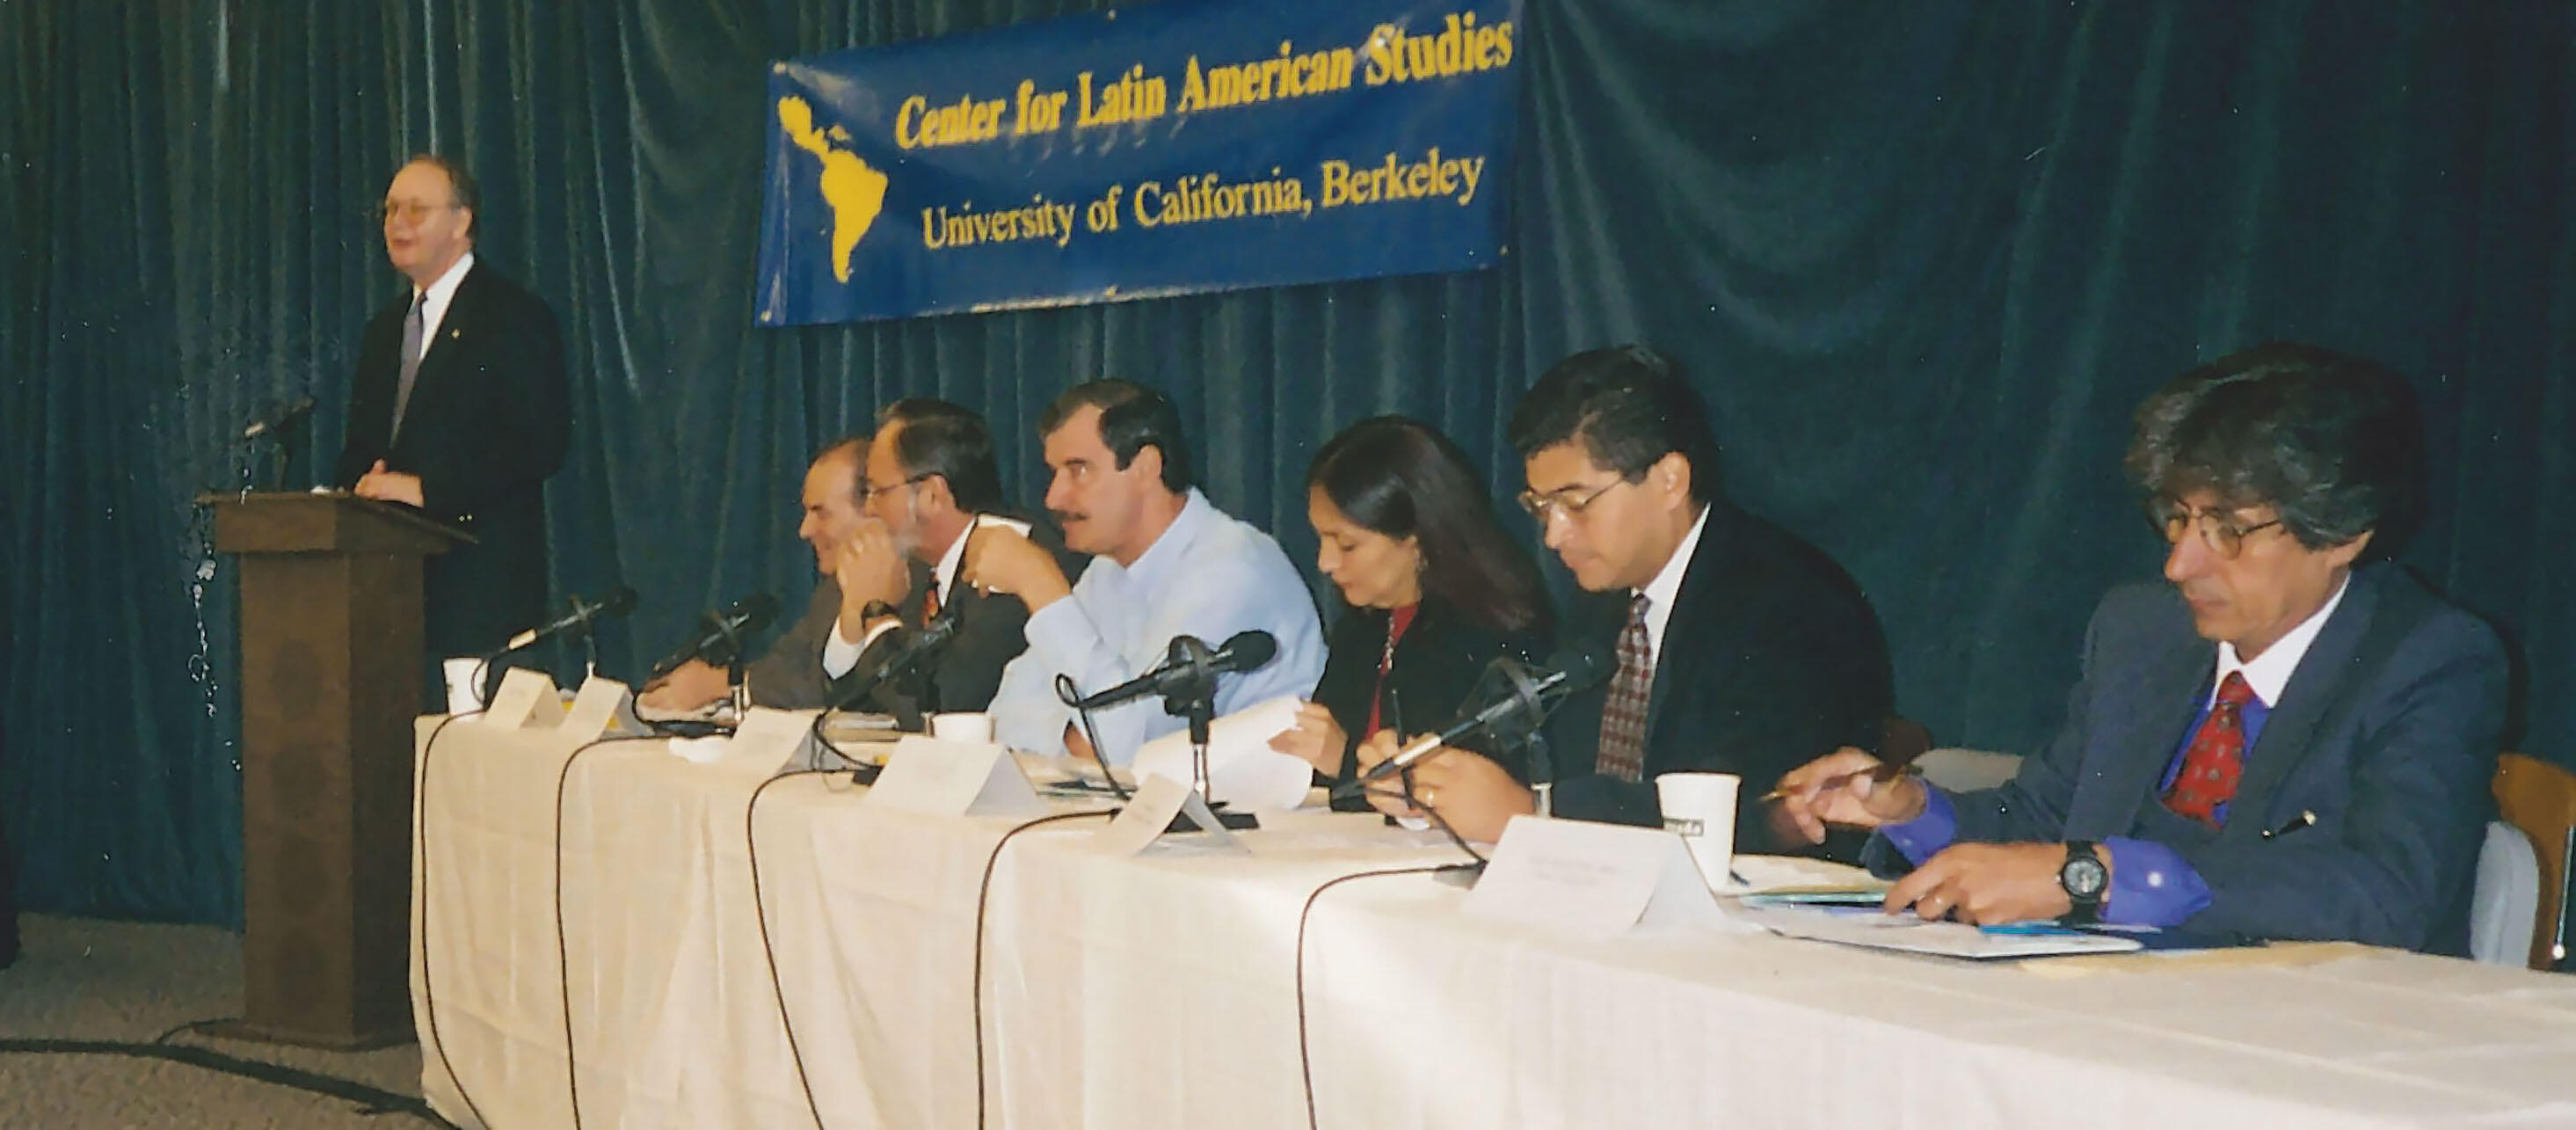 Harley Shaiken, David Bonior, Vicente Fox, Amalia García Medina, Xavier Becerra, and Adolfo Aguilar Zínser listen to UC Berkeley's Chancellor, Robert Berdahl, at the Alternatives for the Americas conference, 1998. (Photo by CLAS staff.)